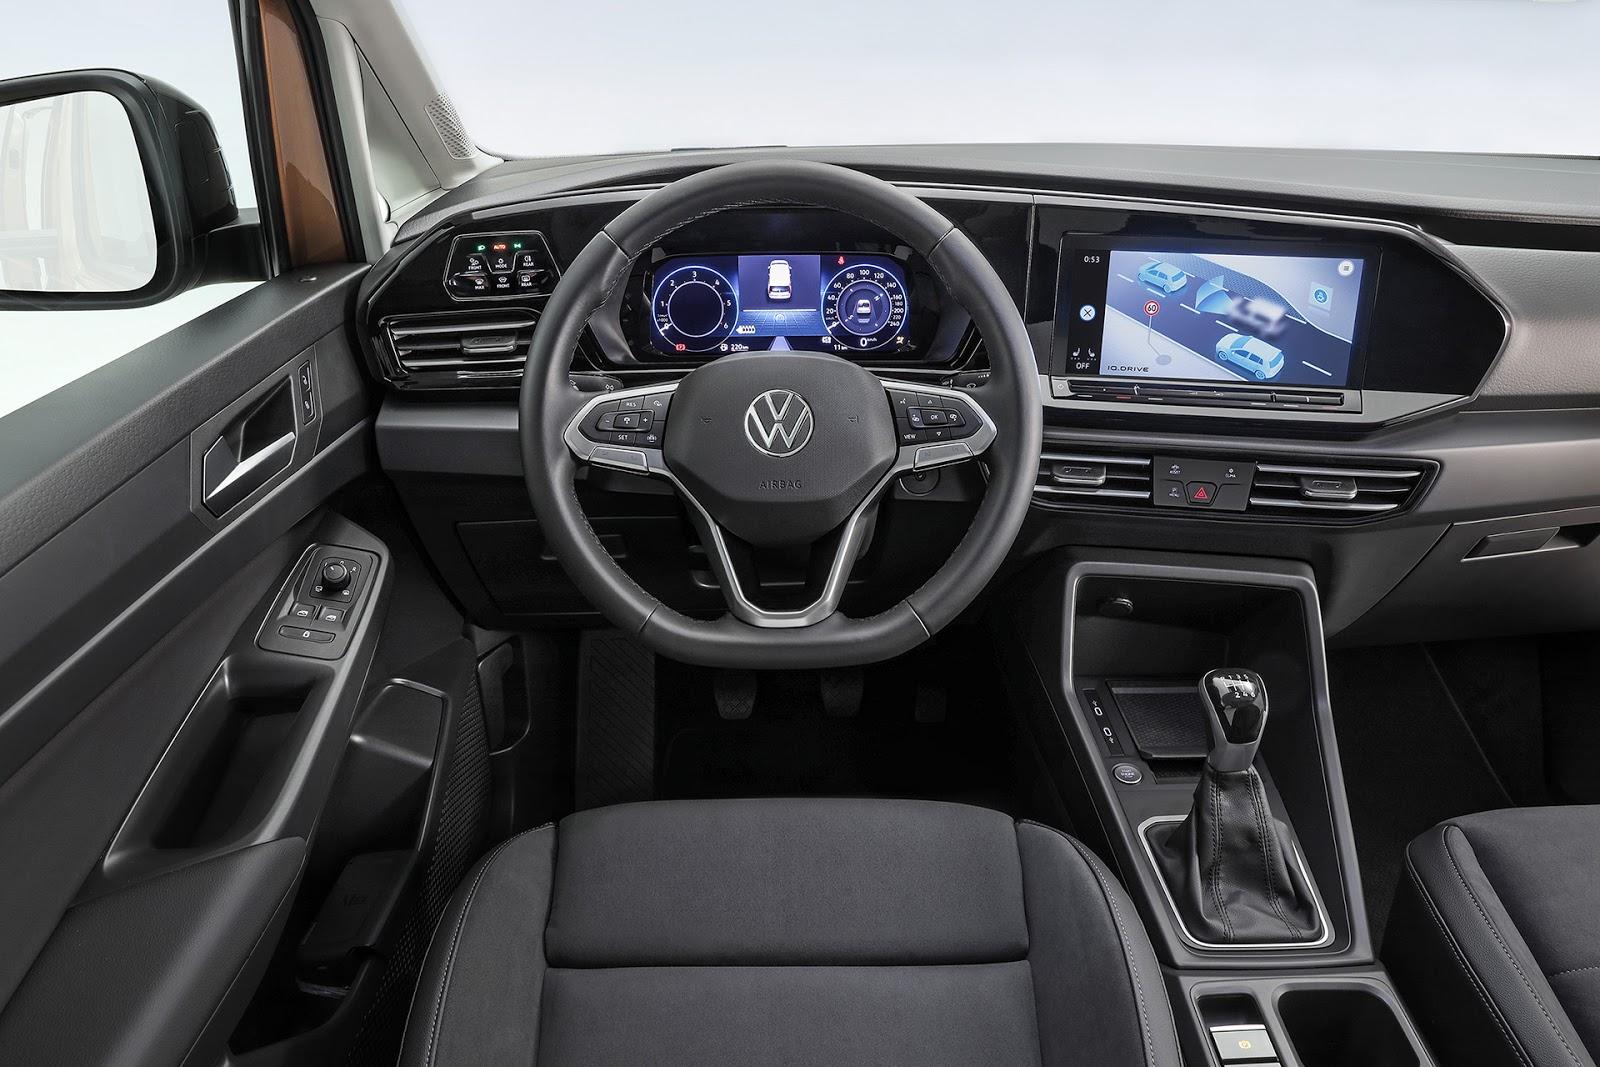 NEO2BVOLKSWAGEN2BCADDY2B5 12 1 Νέο Volkswagen Caddy 5: μεγαλύτερο, πρακτικότερο, αποδοτικότερο, εξυπνότερο Caddy, MPV, Volkswagen, Volkswagen Caddy, VW, VW Caddy, ειδήσεις, Επαγγελματικά